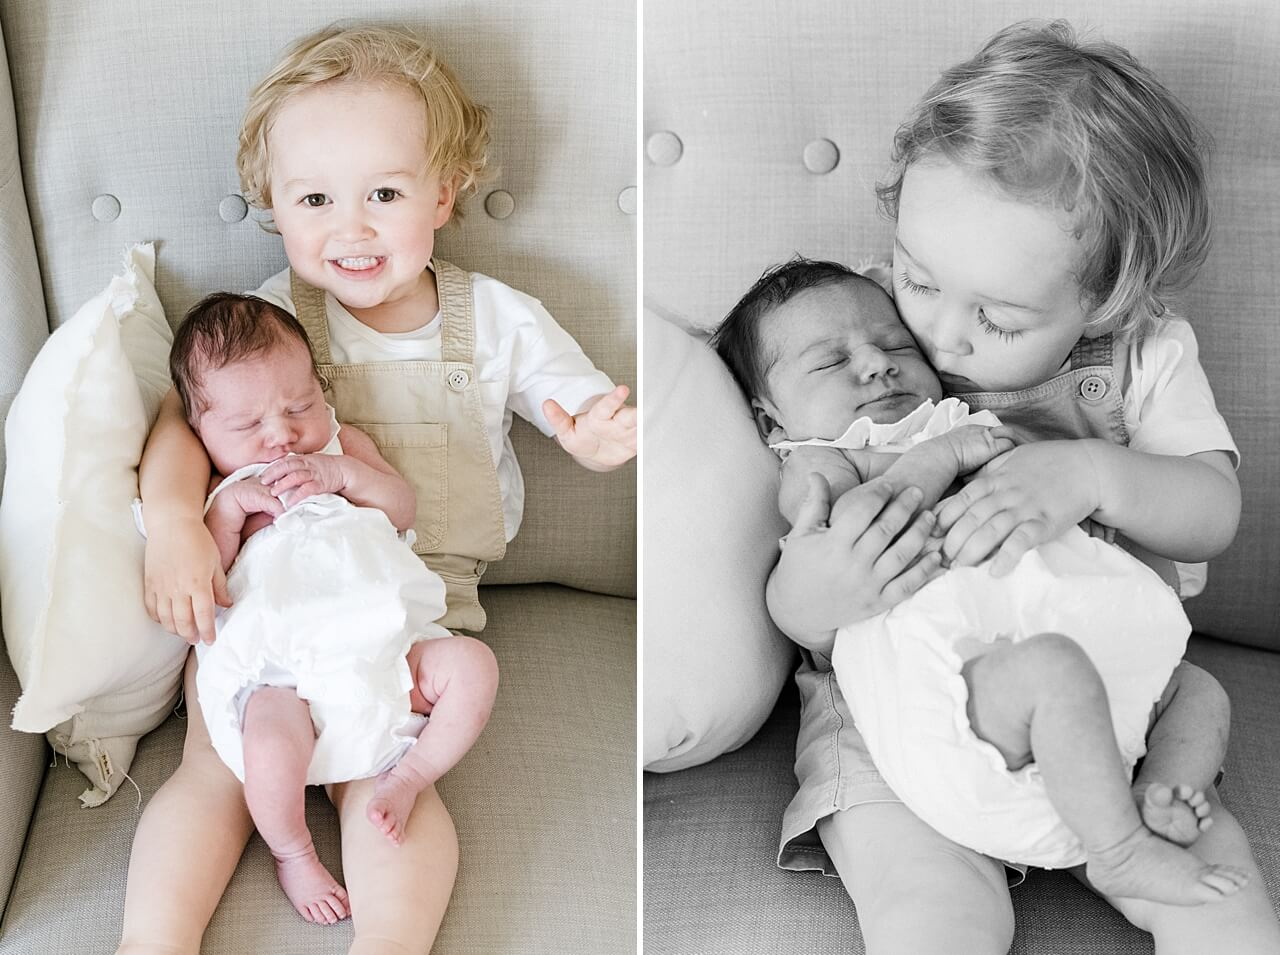 Rebecca Conte Fotografie: Zarte Neugeborenenbilder 28